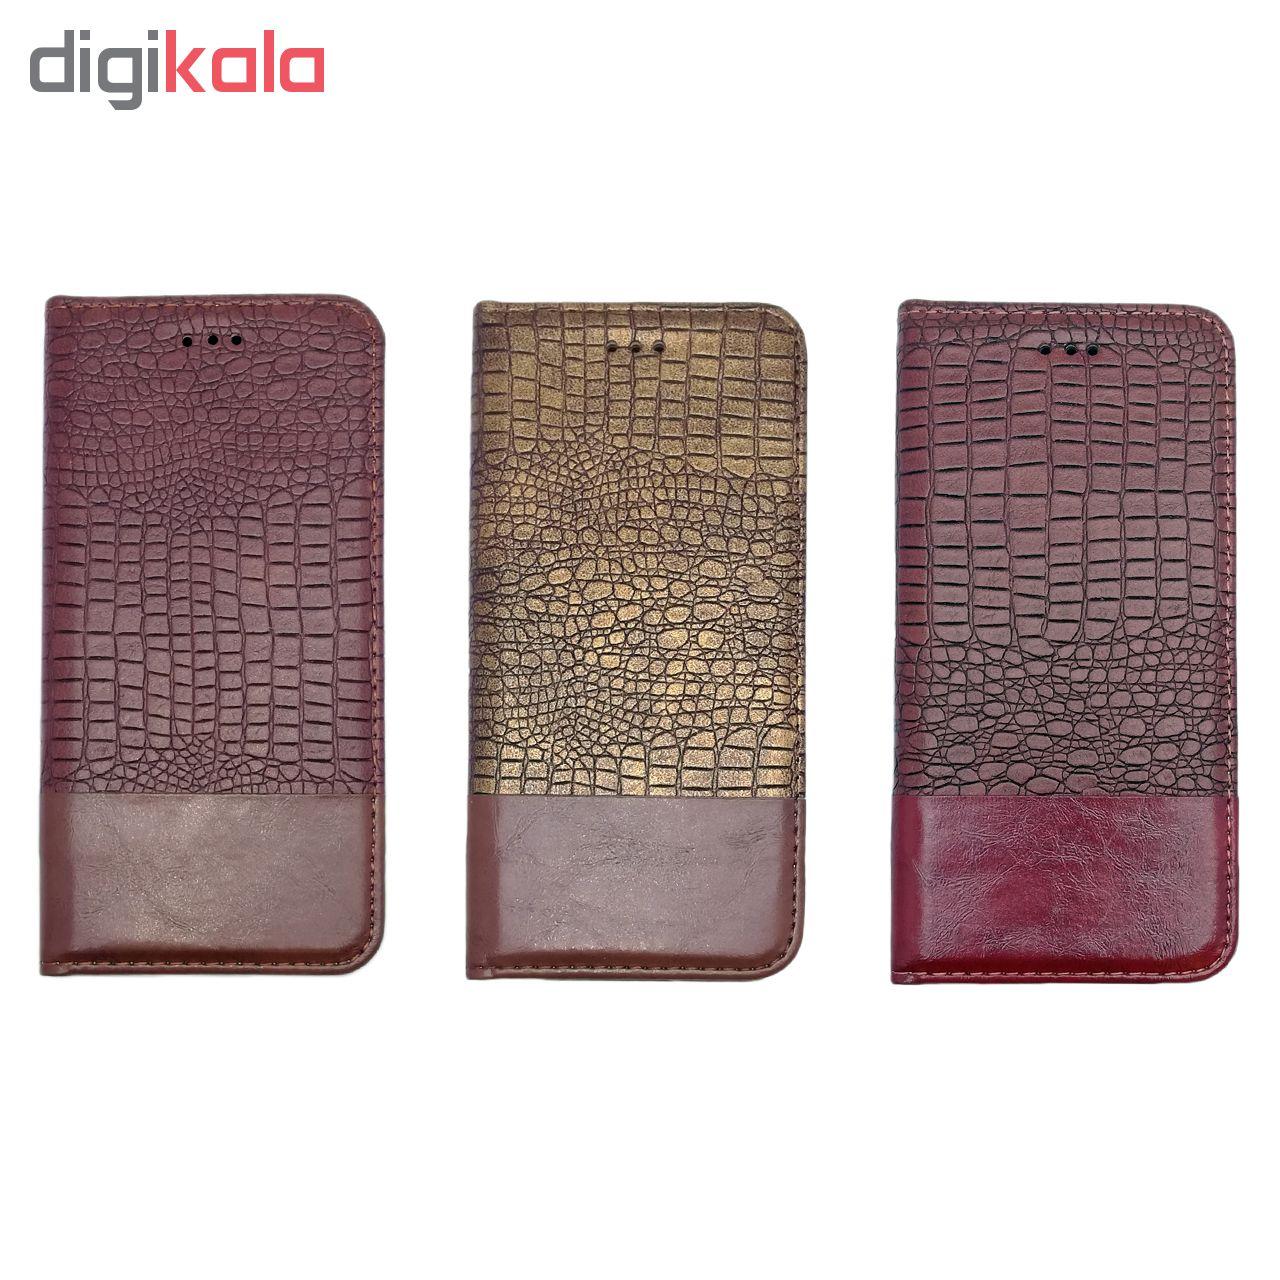 کیف کلاسوری مدل A2 مناسب برای گوشی موبایل اپل iphone 7/8 main 1 5